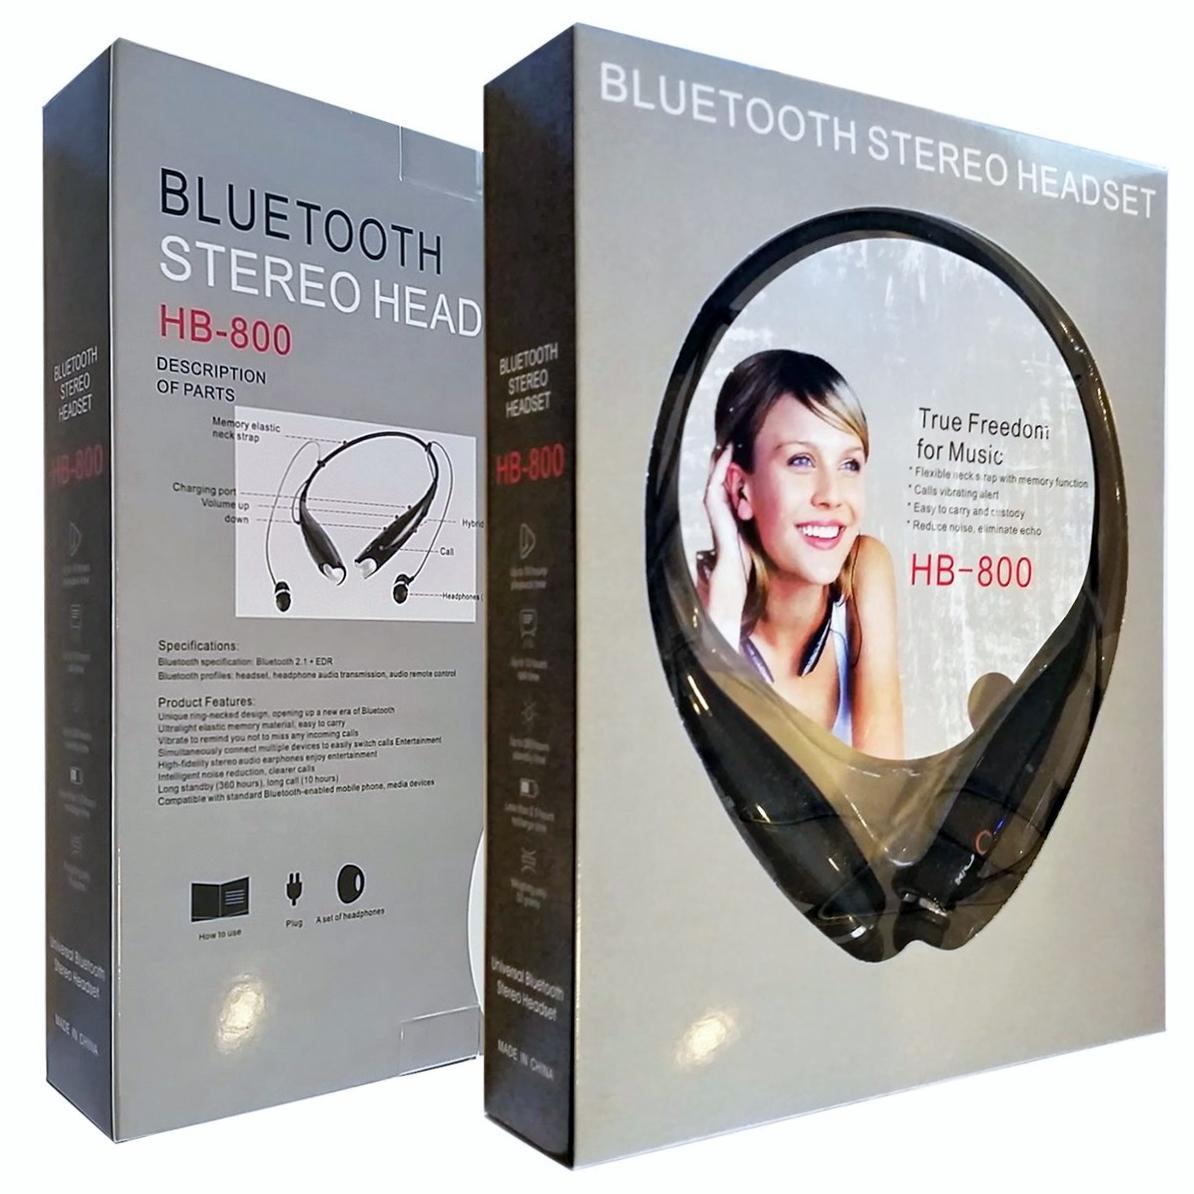 Беспроводная гарнитура Bluetooth stereo headset HV-800 оптом